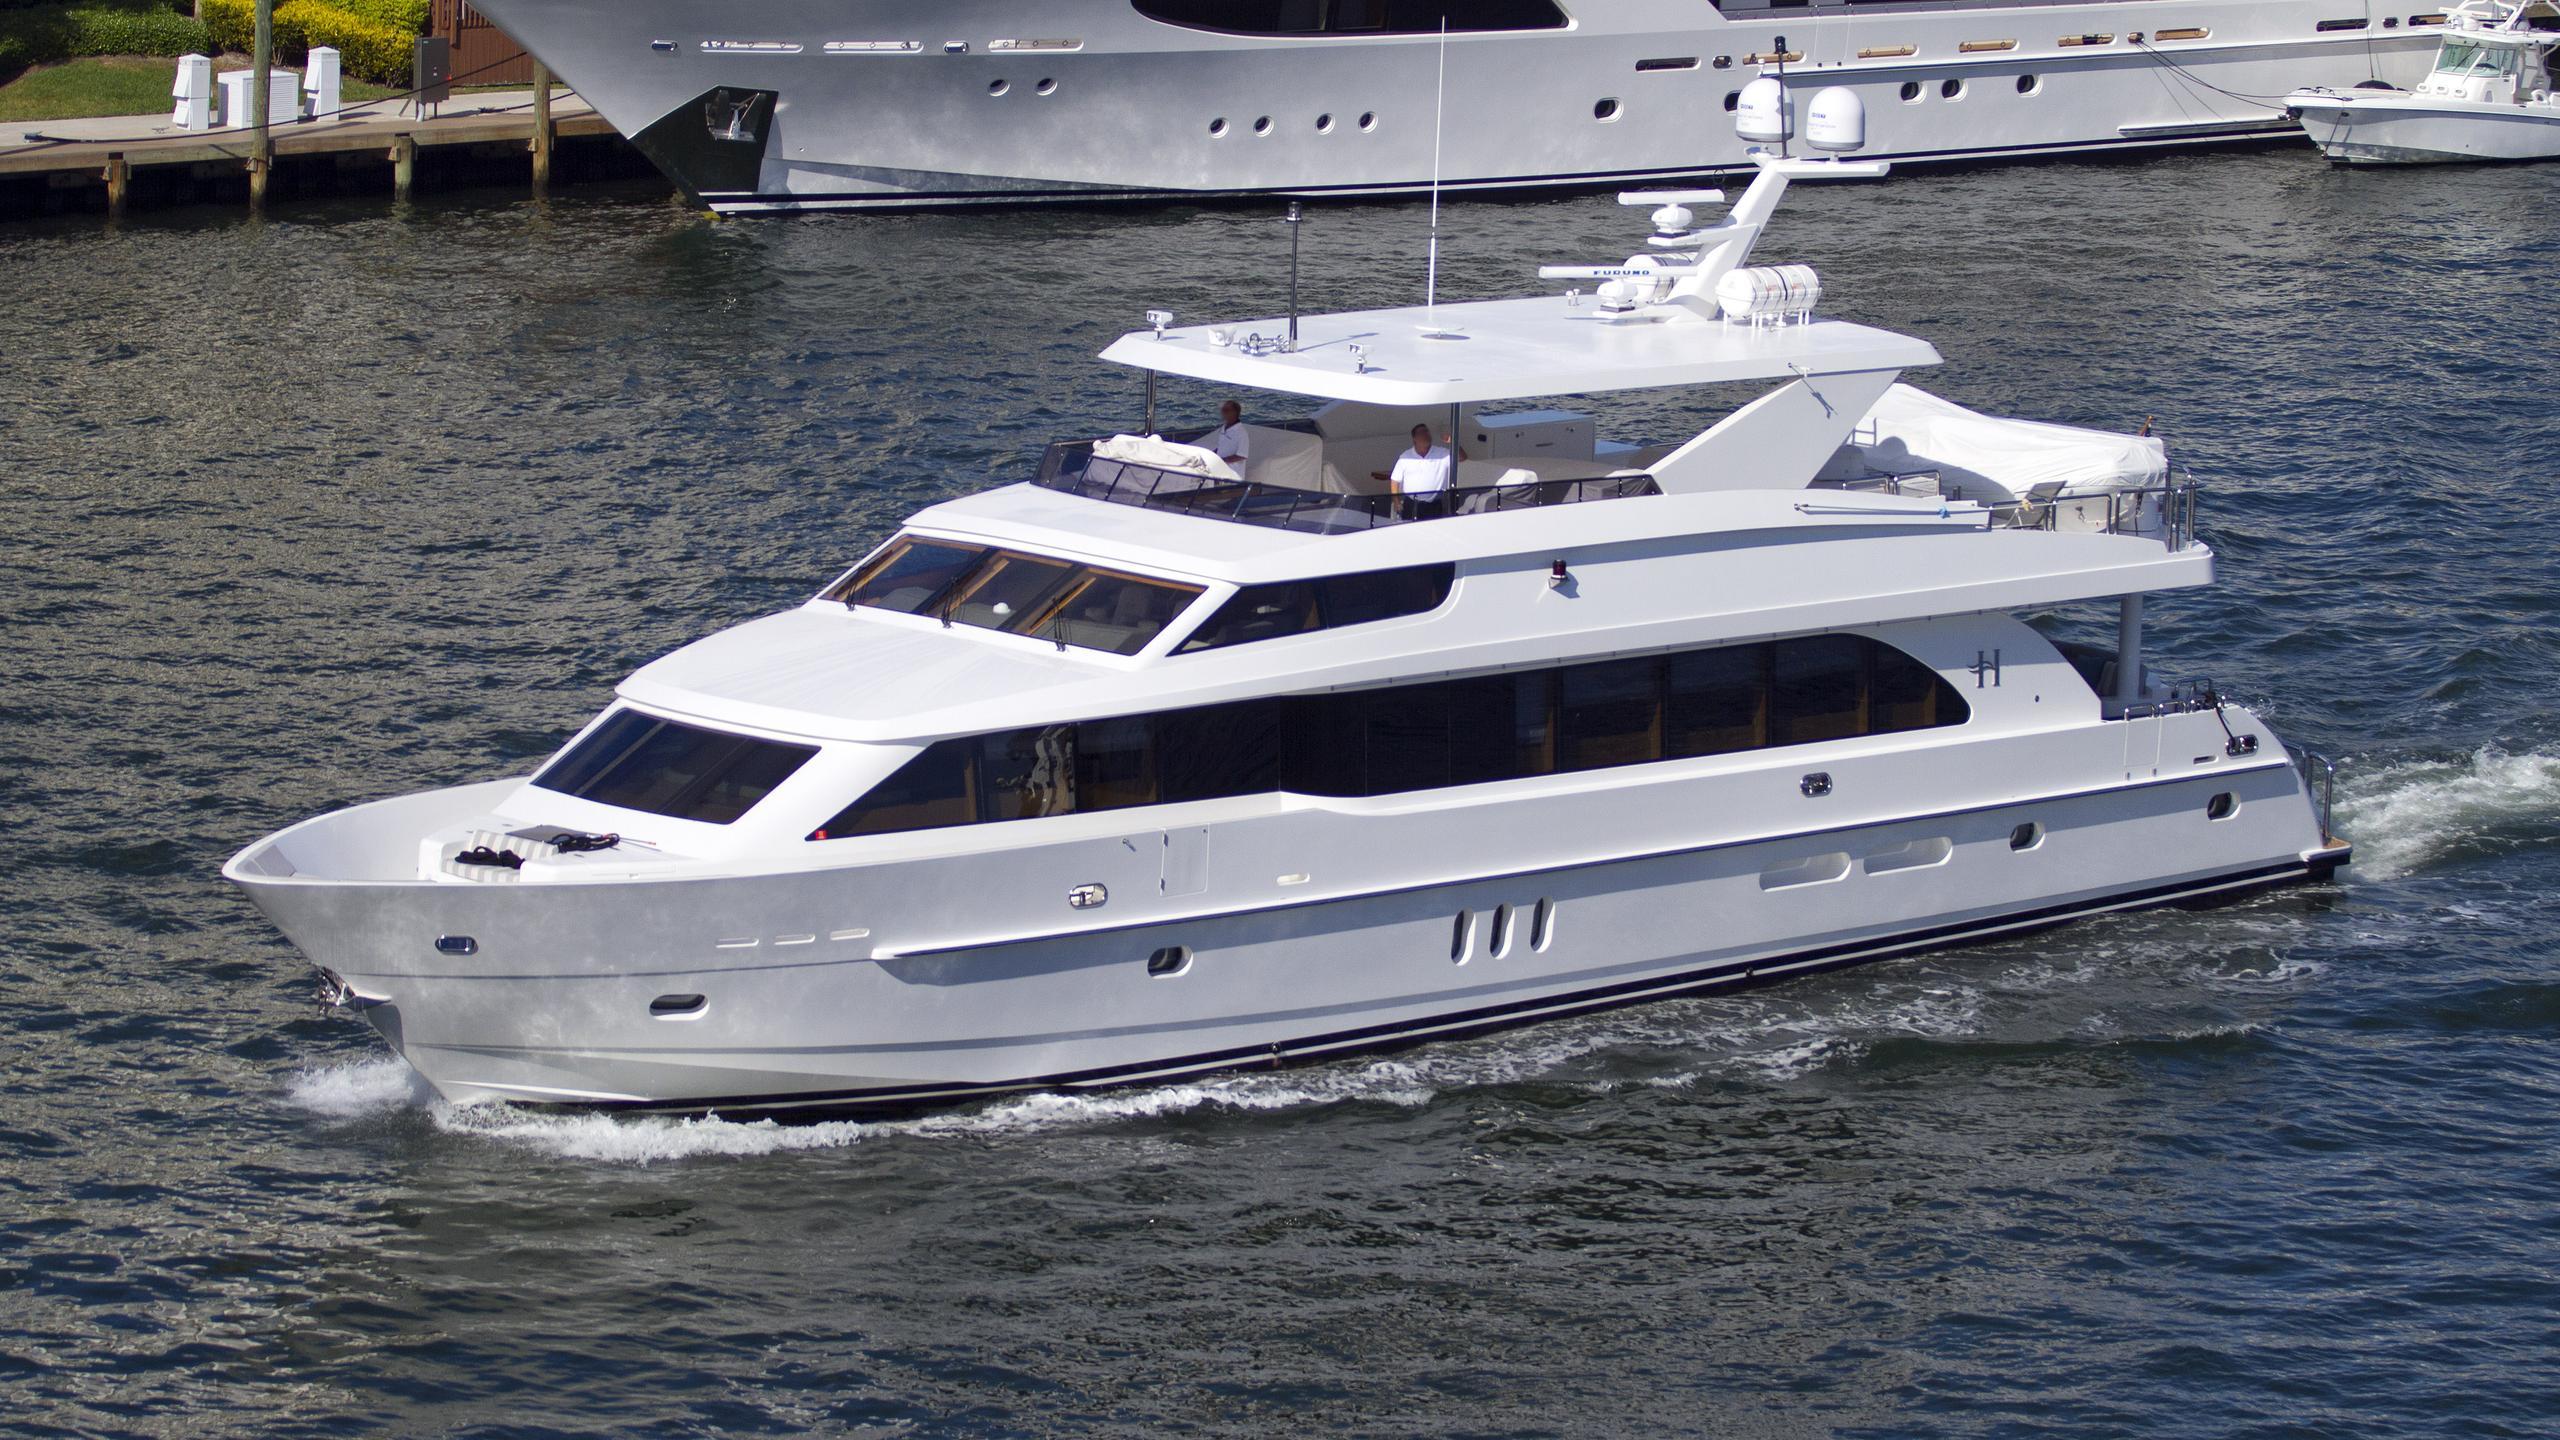 sassy-motoryacht-hargrave-101-2013-31m-bow-running